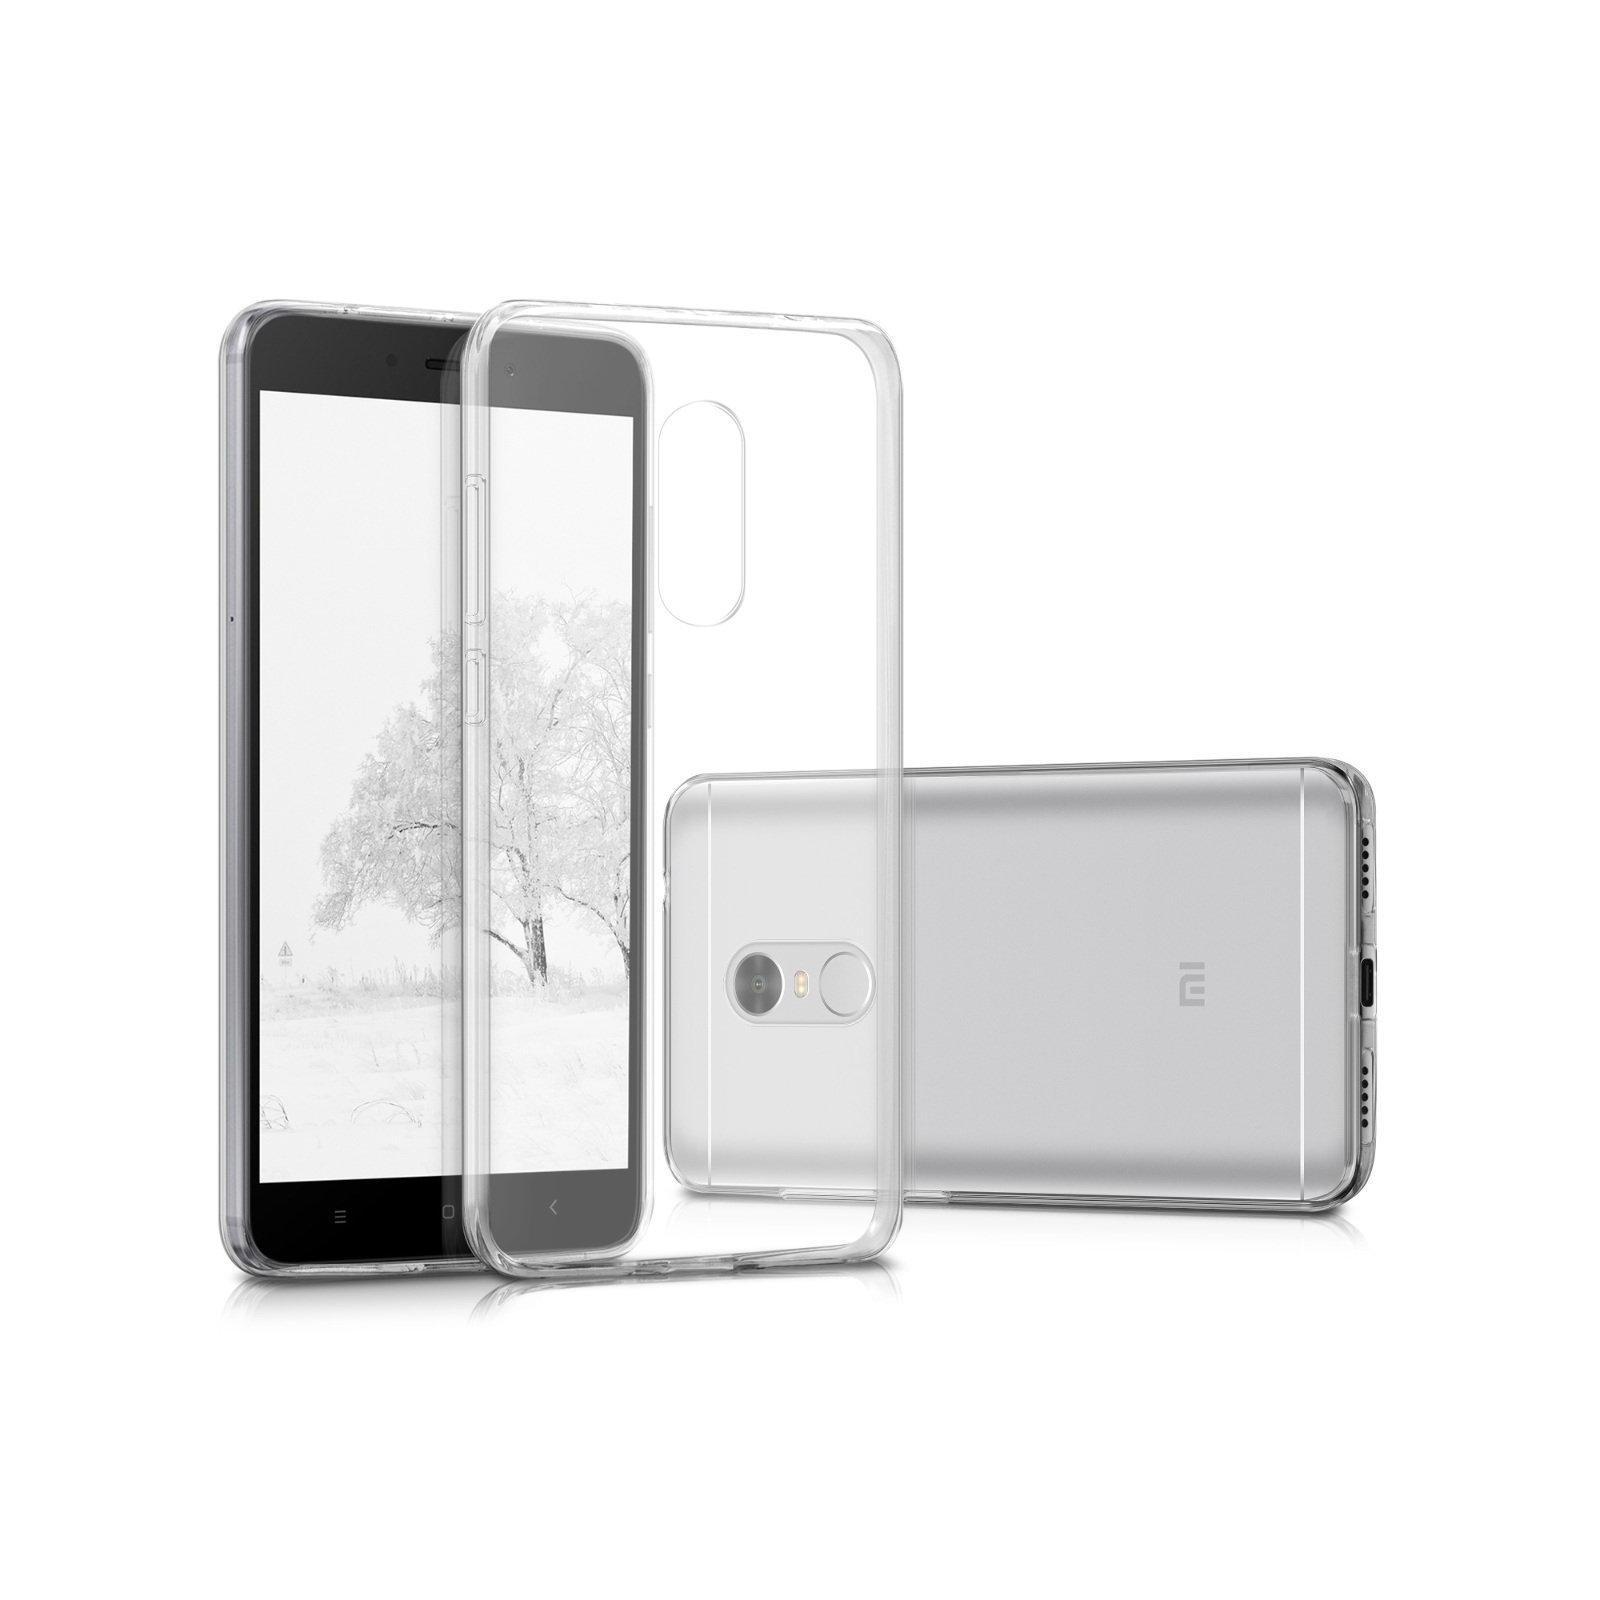 Чехол для моб. телефона SmartCase Xiaomi Redmi Note 4 TPU Clear (SC-RMIN4) изображение 2